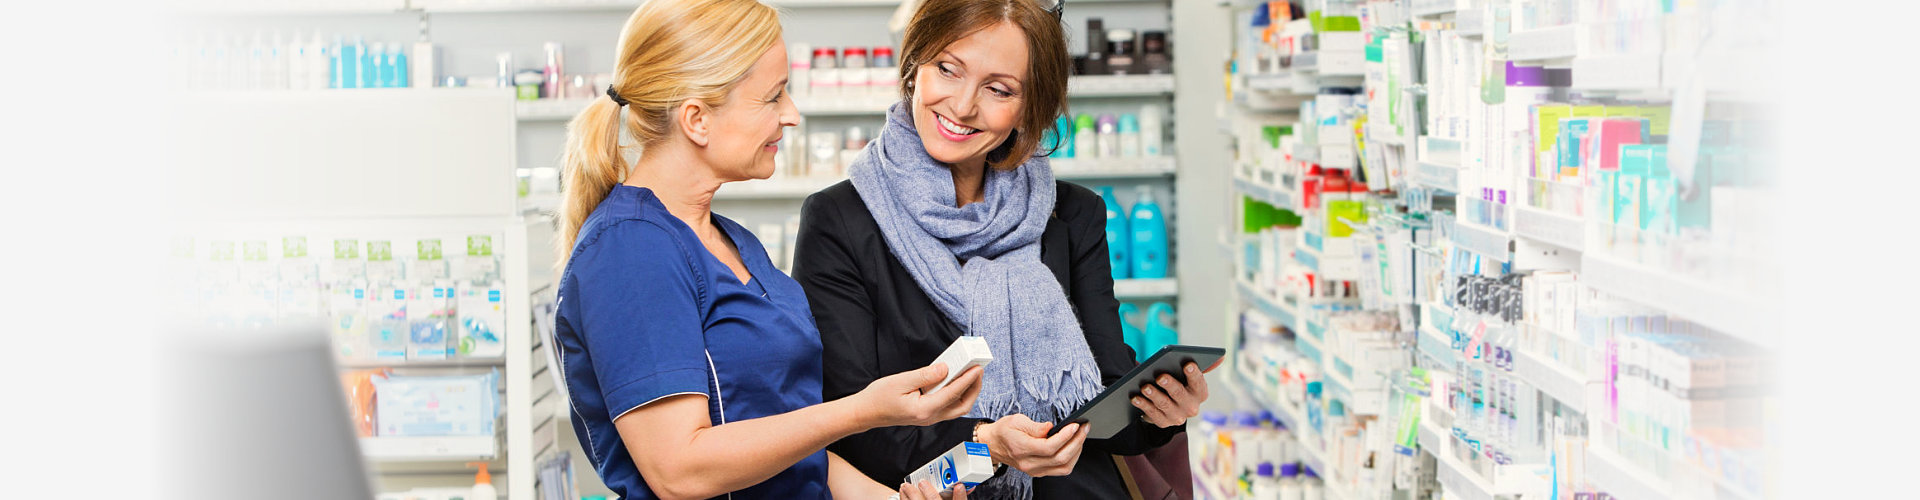 pharmacist showing eye drop to customer